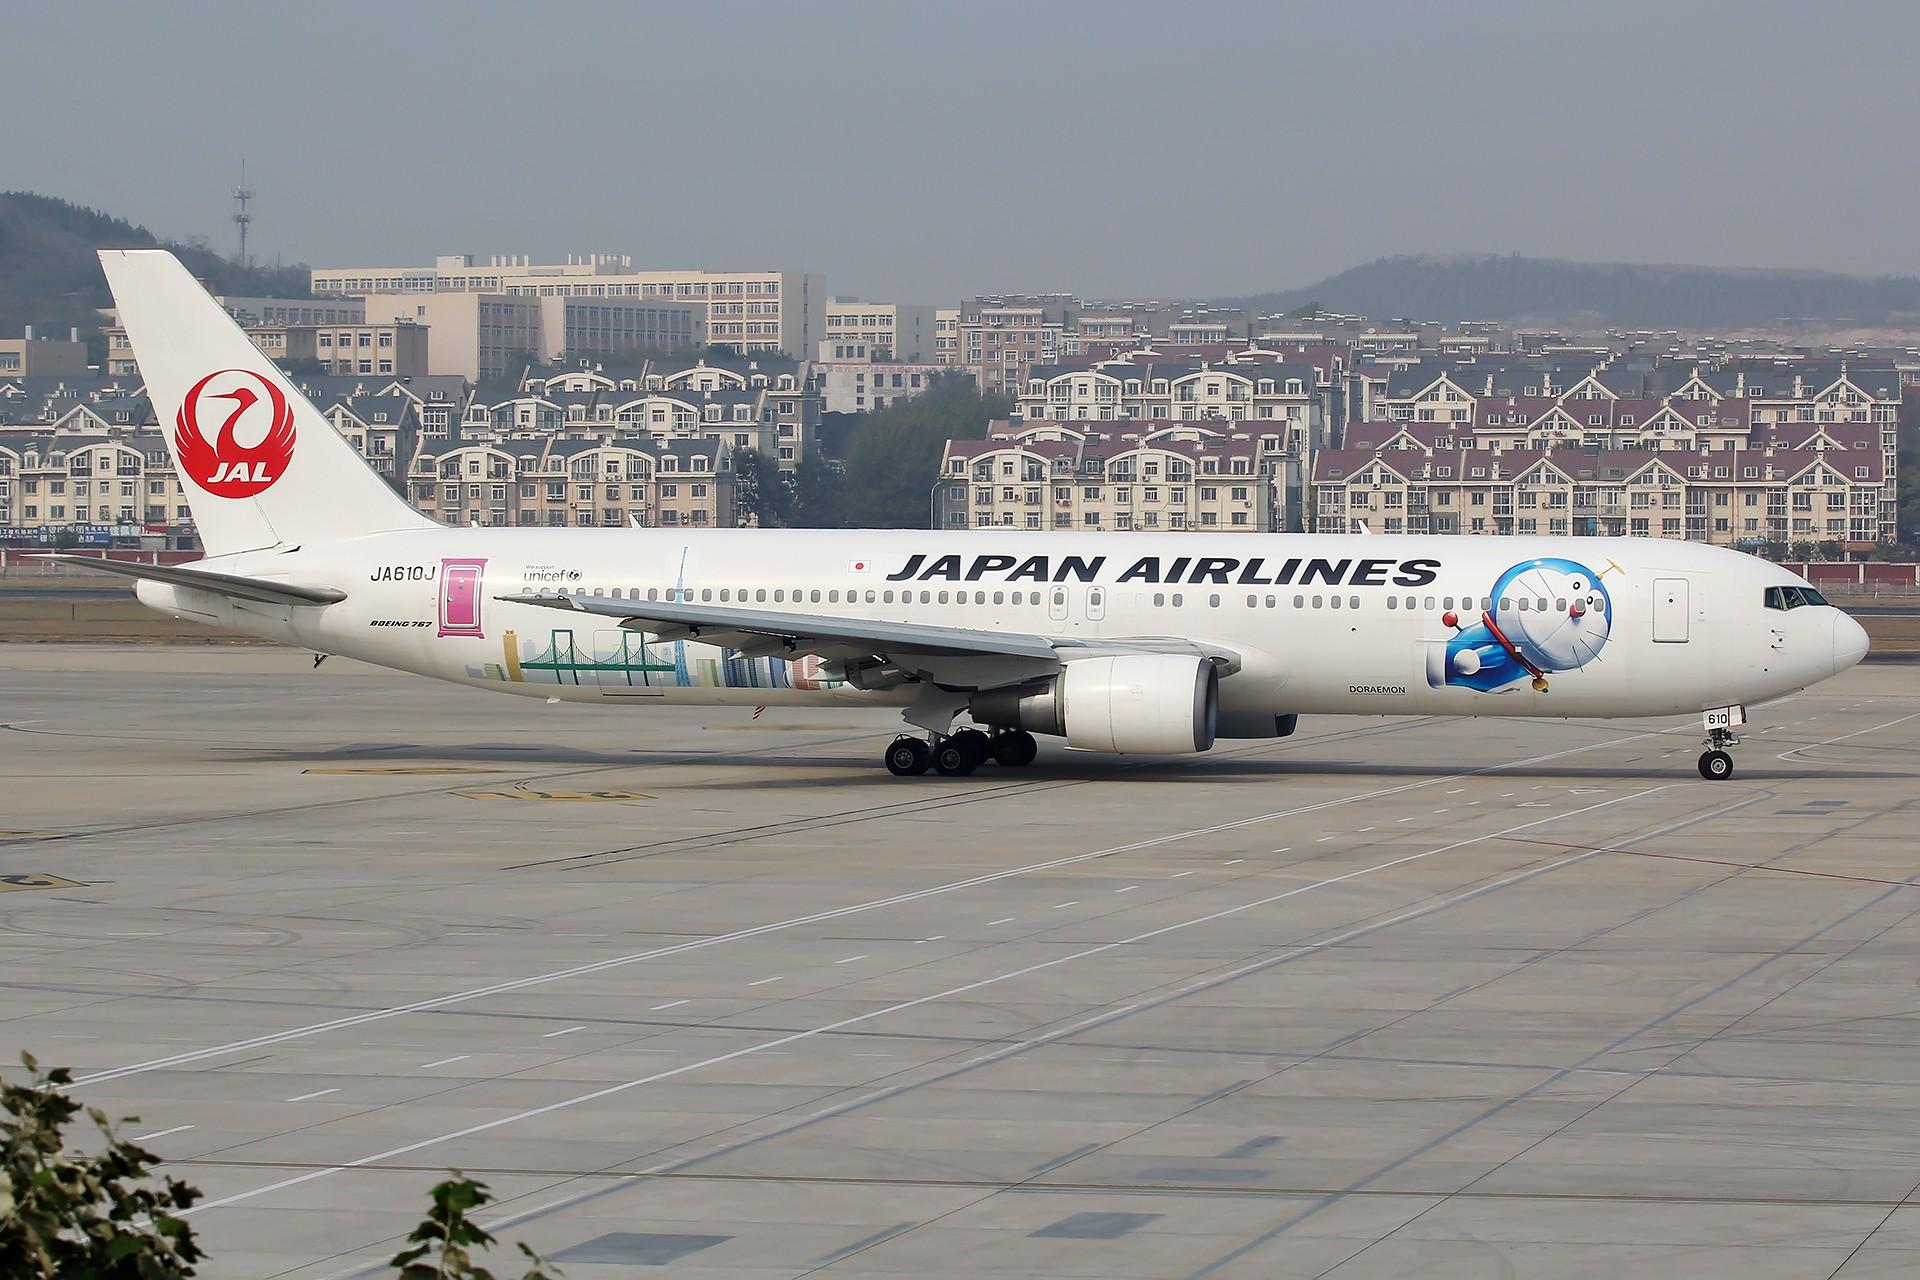 Re:[原创][DLC]。。。JAL 哆啦A梦 。。。 BOEING 767-300 JA610J 中国大连国际机场